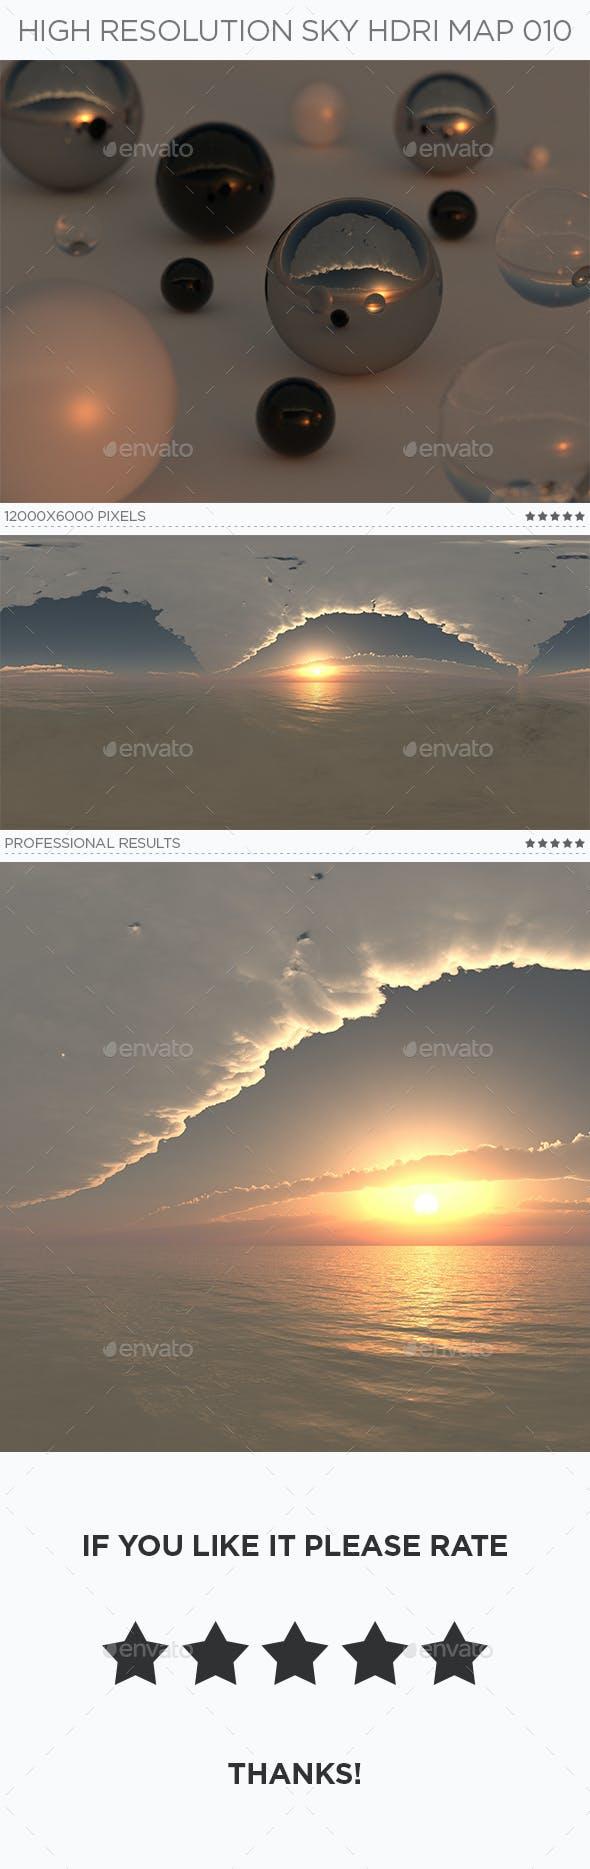 High Resolution Sky HDRi Map 010 - 3DOcean Item for Sale